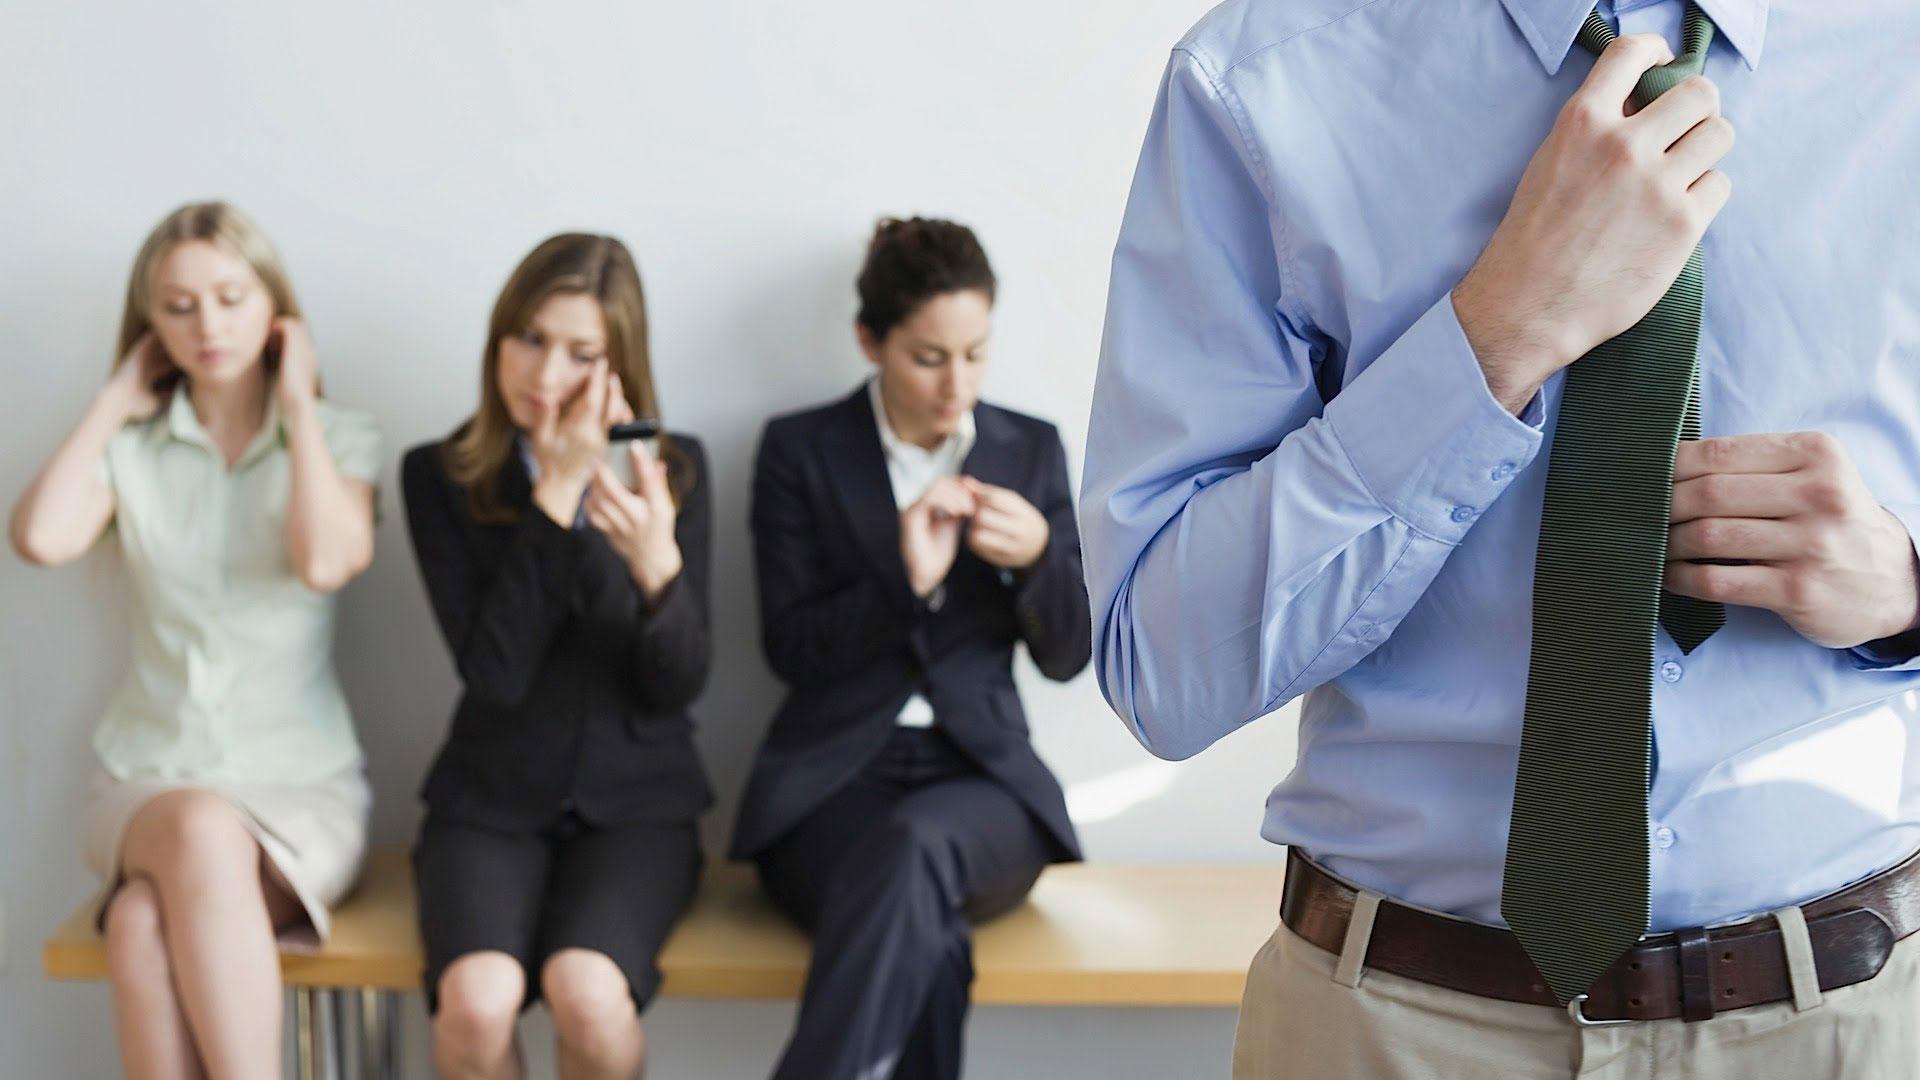 Обманули при трудоустройстве